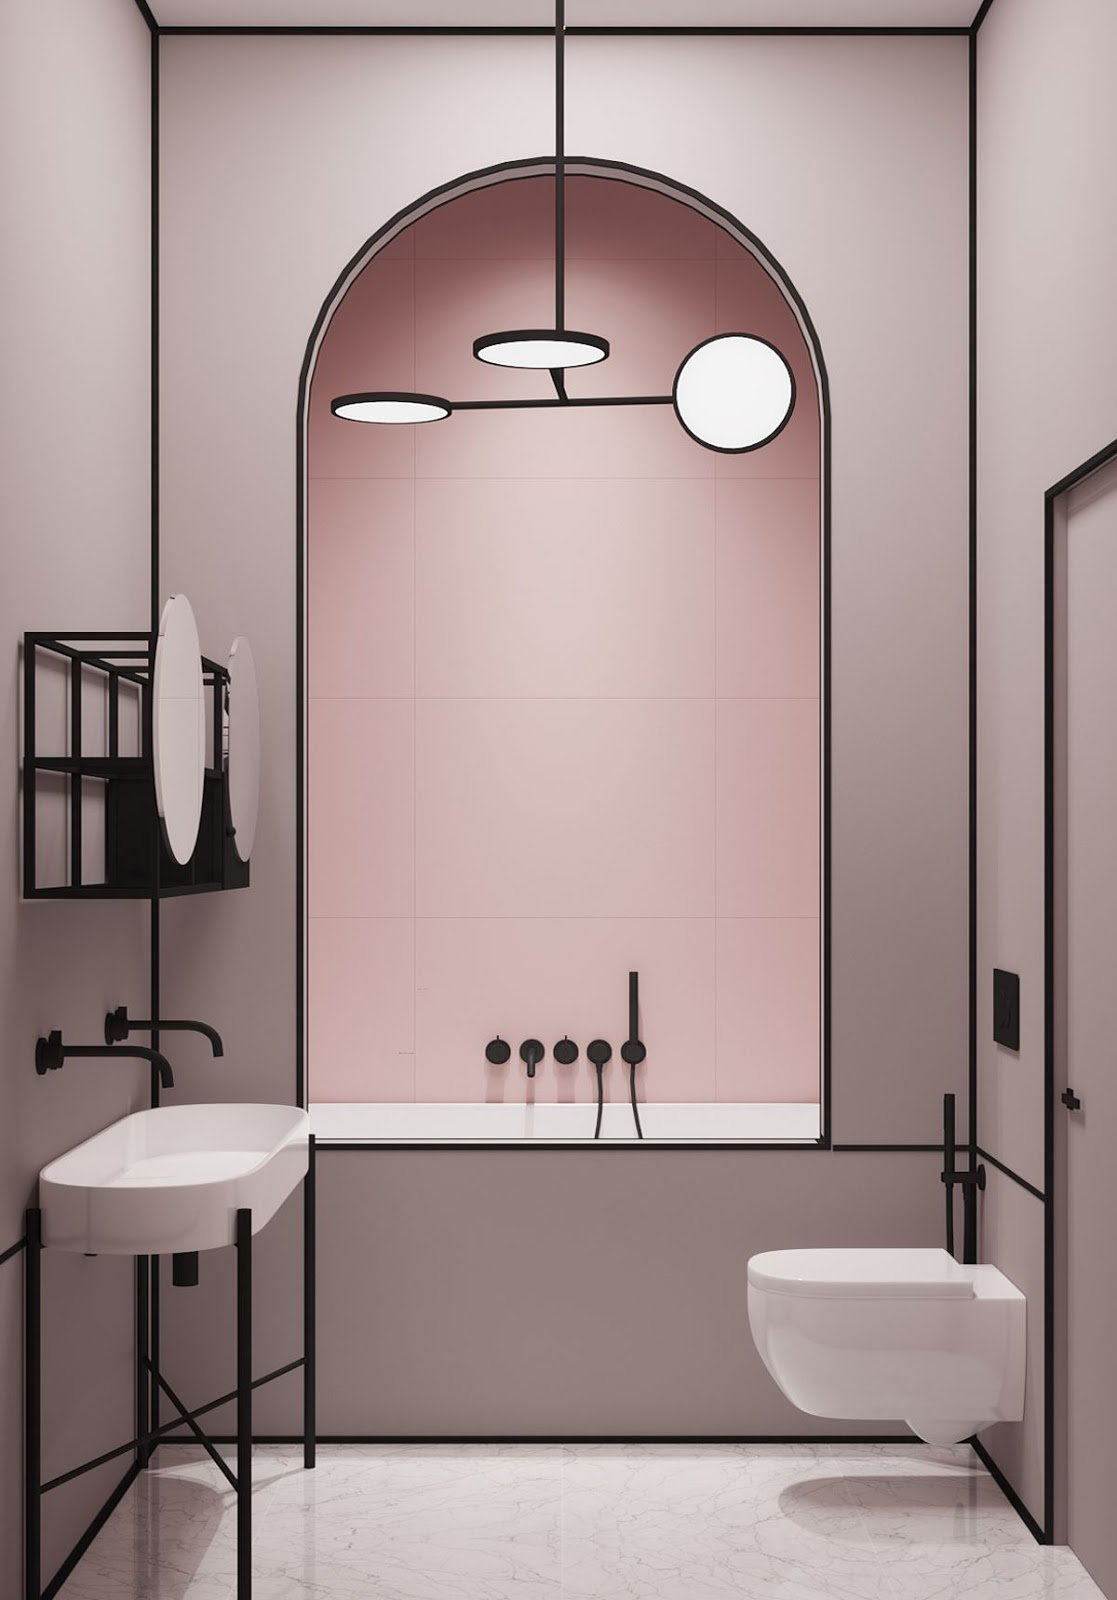 Salle de bain contemporaine rose carrelage marbre peinture ...